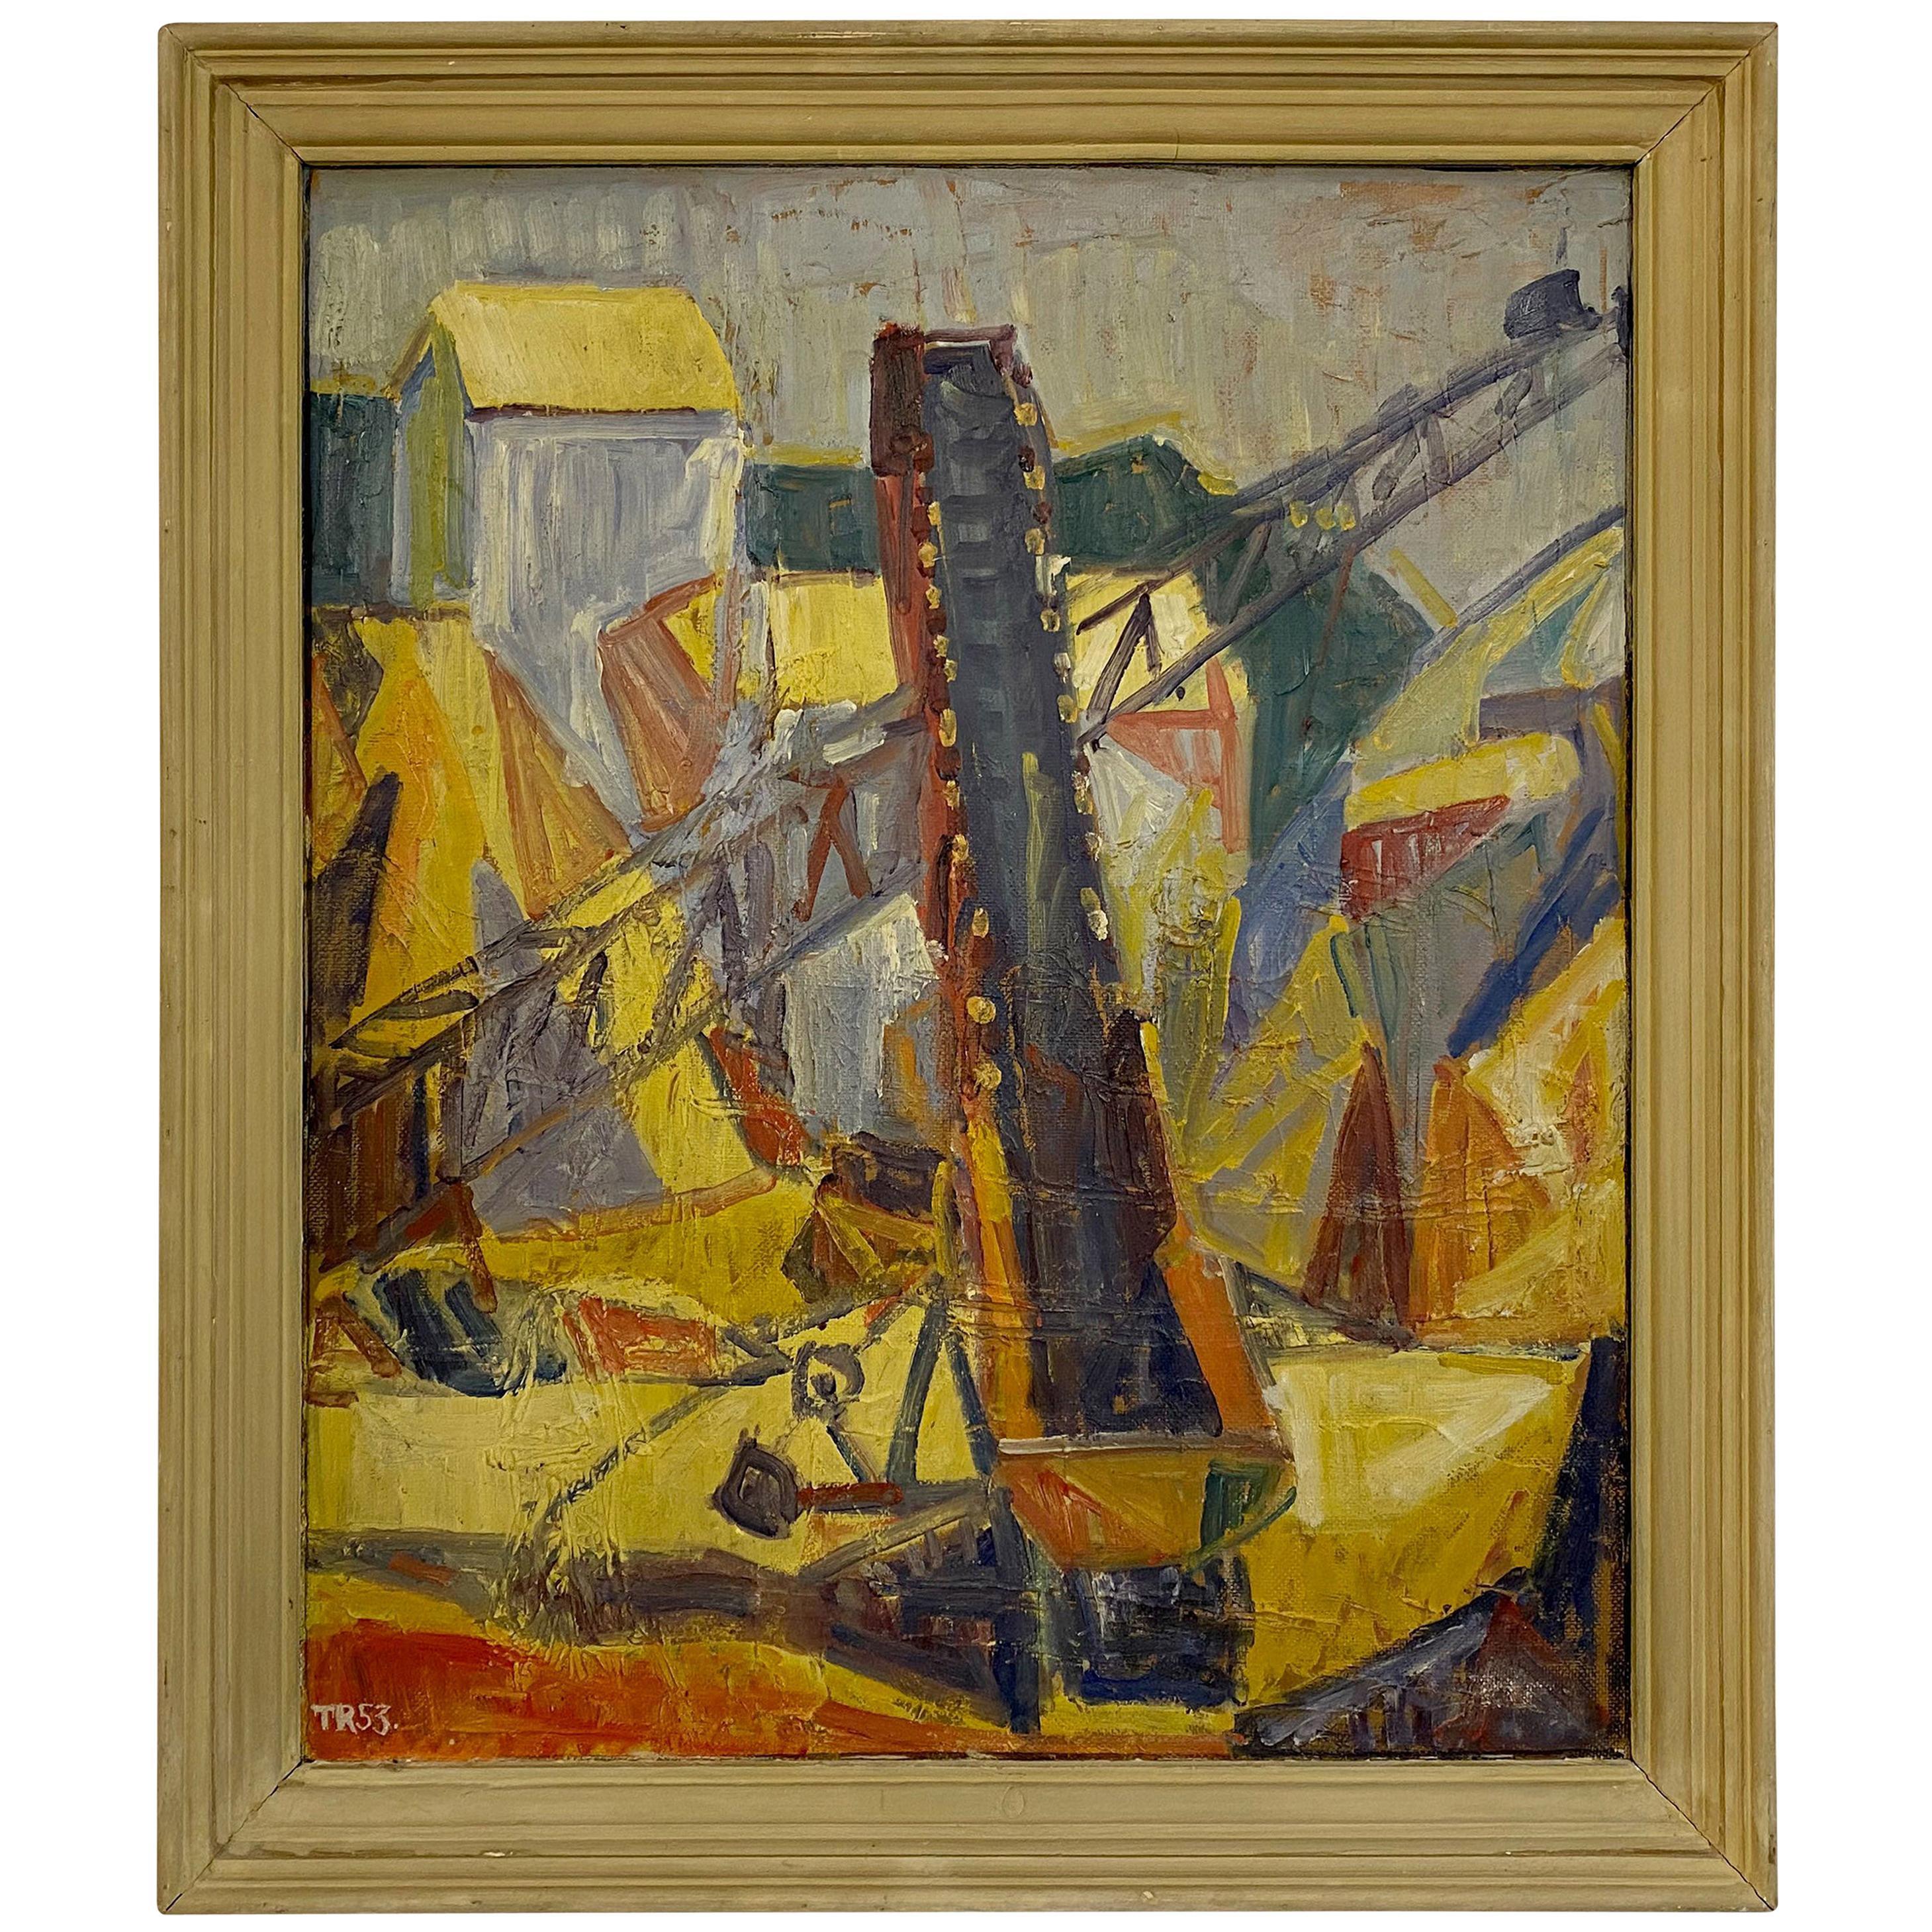 Midcentury 1950s Danish Oil Painting